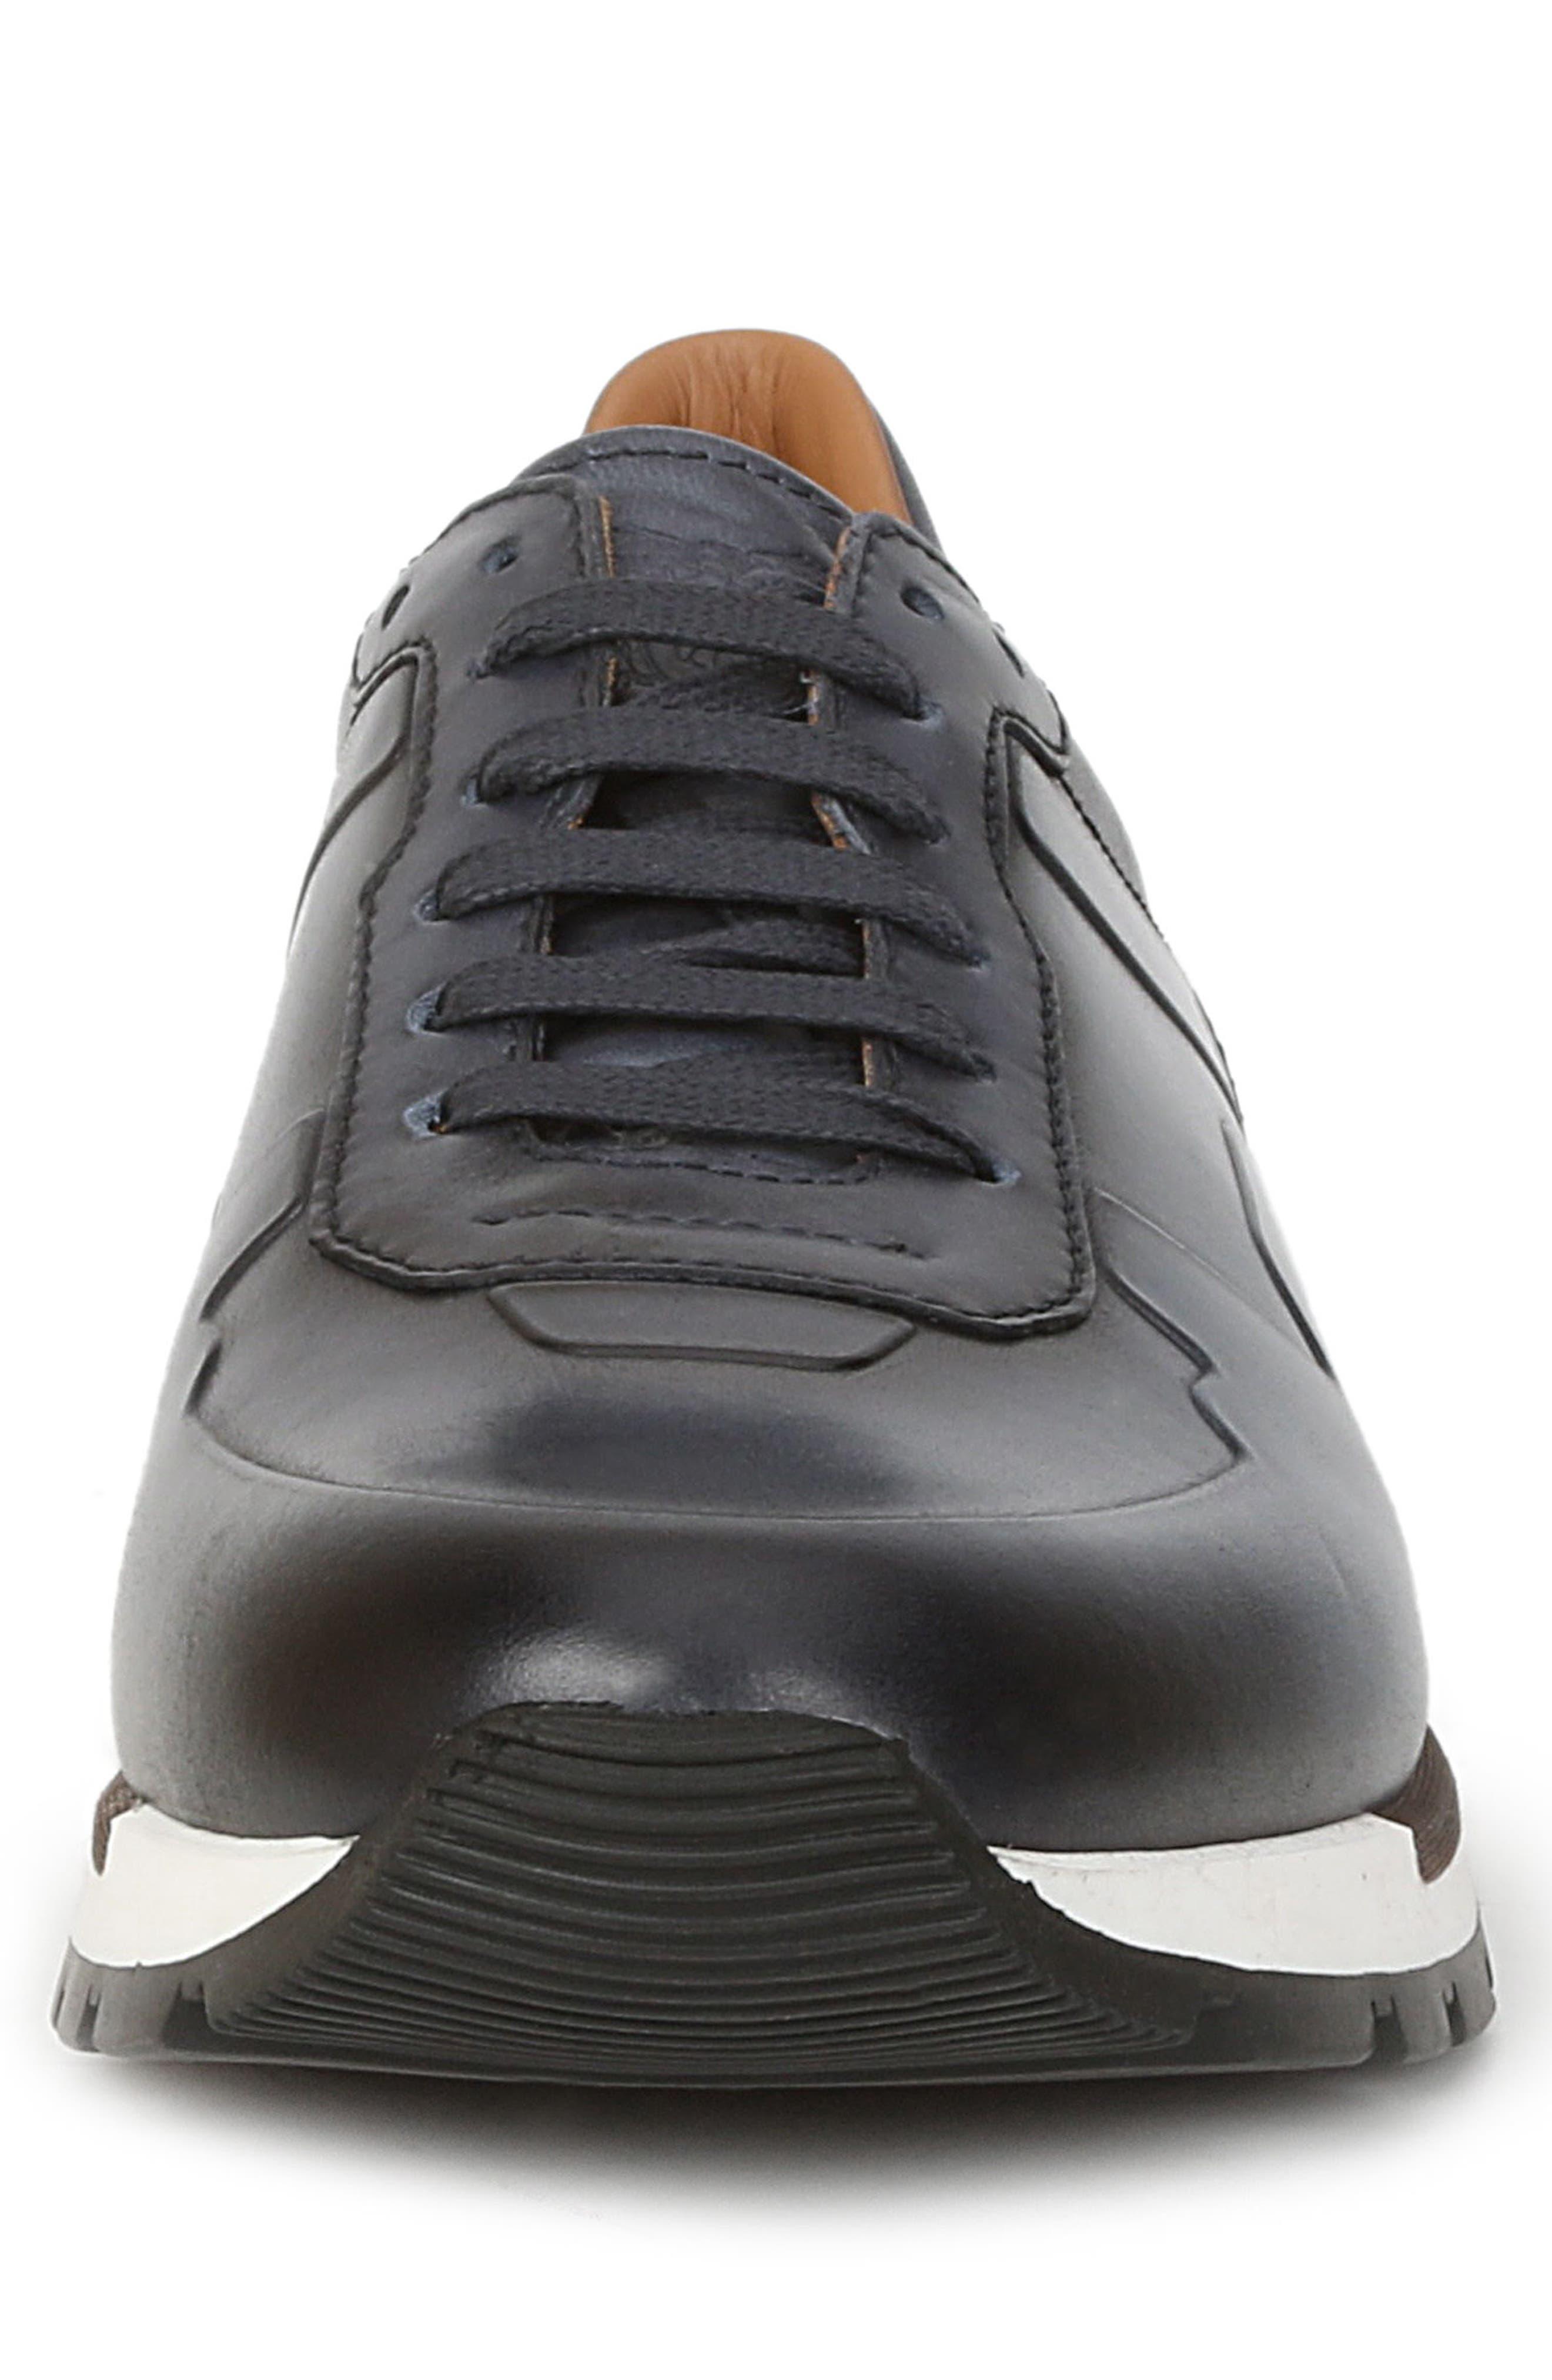 Davio Low Top Sneaker,                             Alternate thumbnail 4, color,                             NAVY